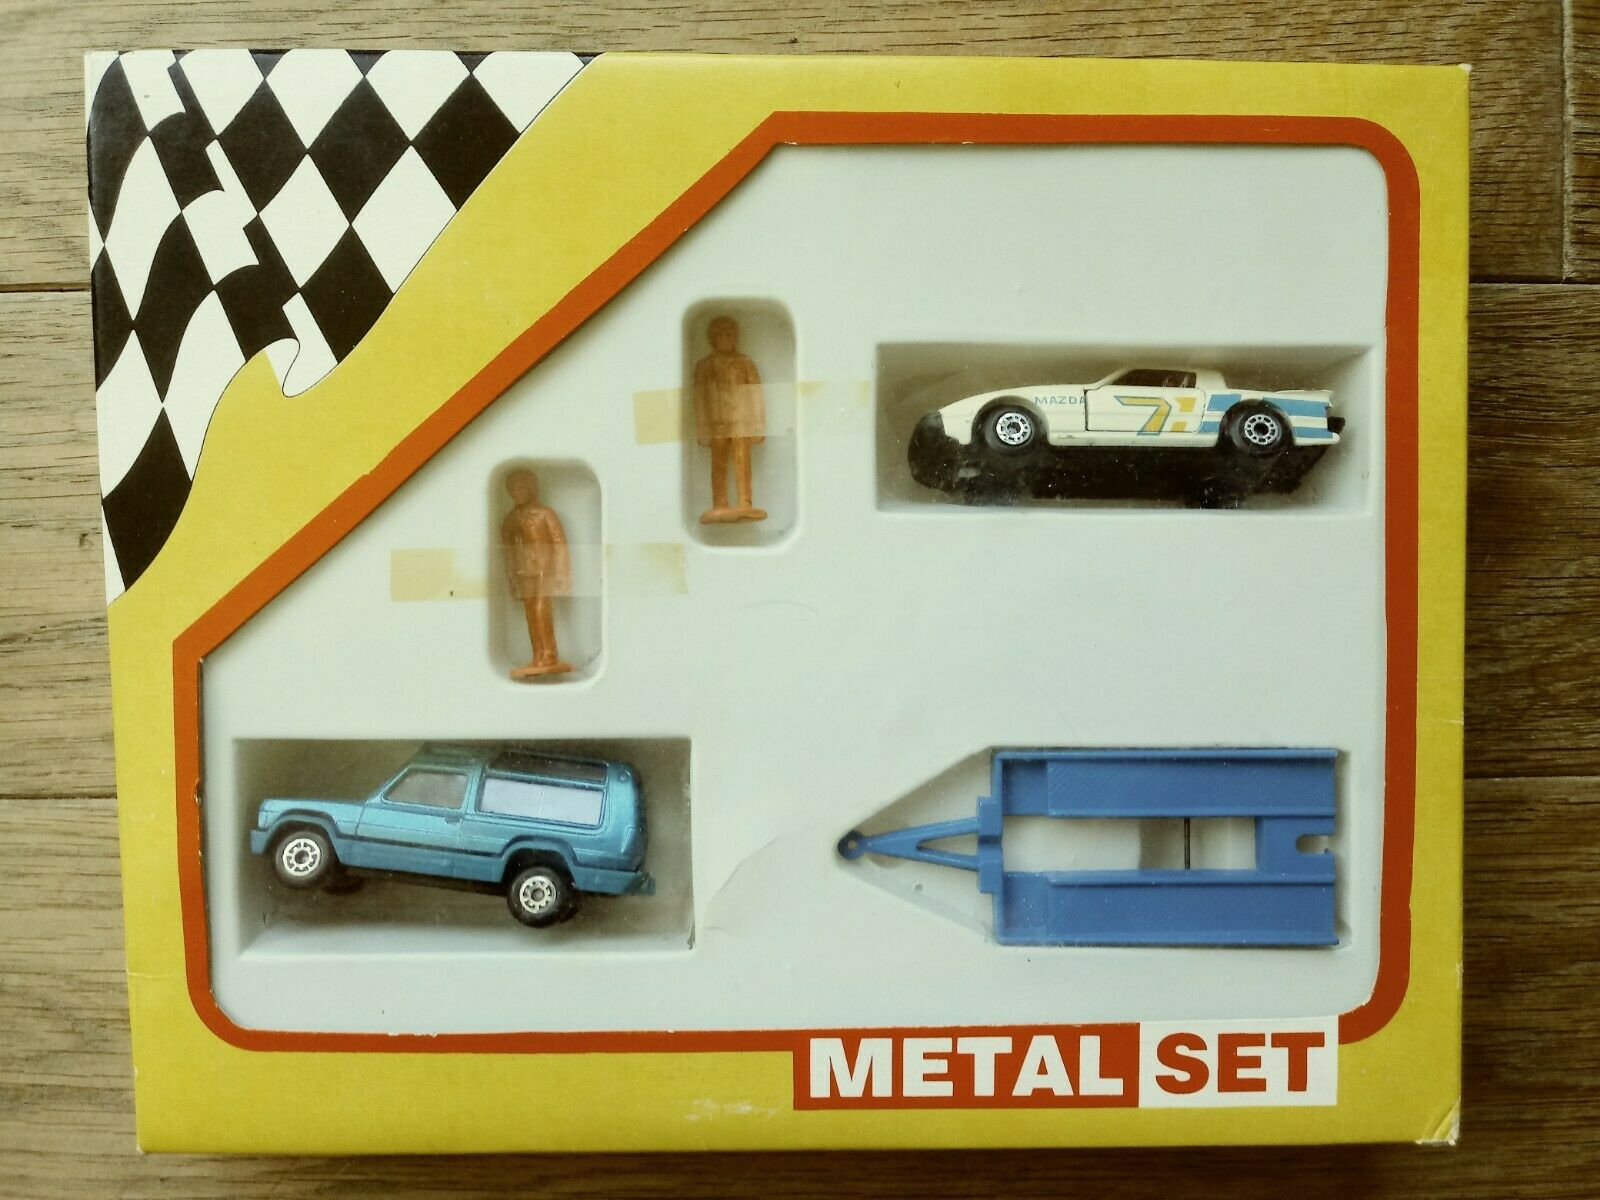 MATCHBOX SET. Made in Bulgaria